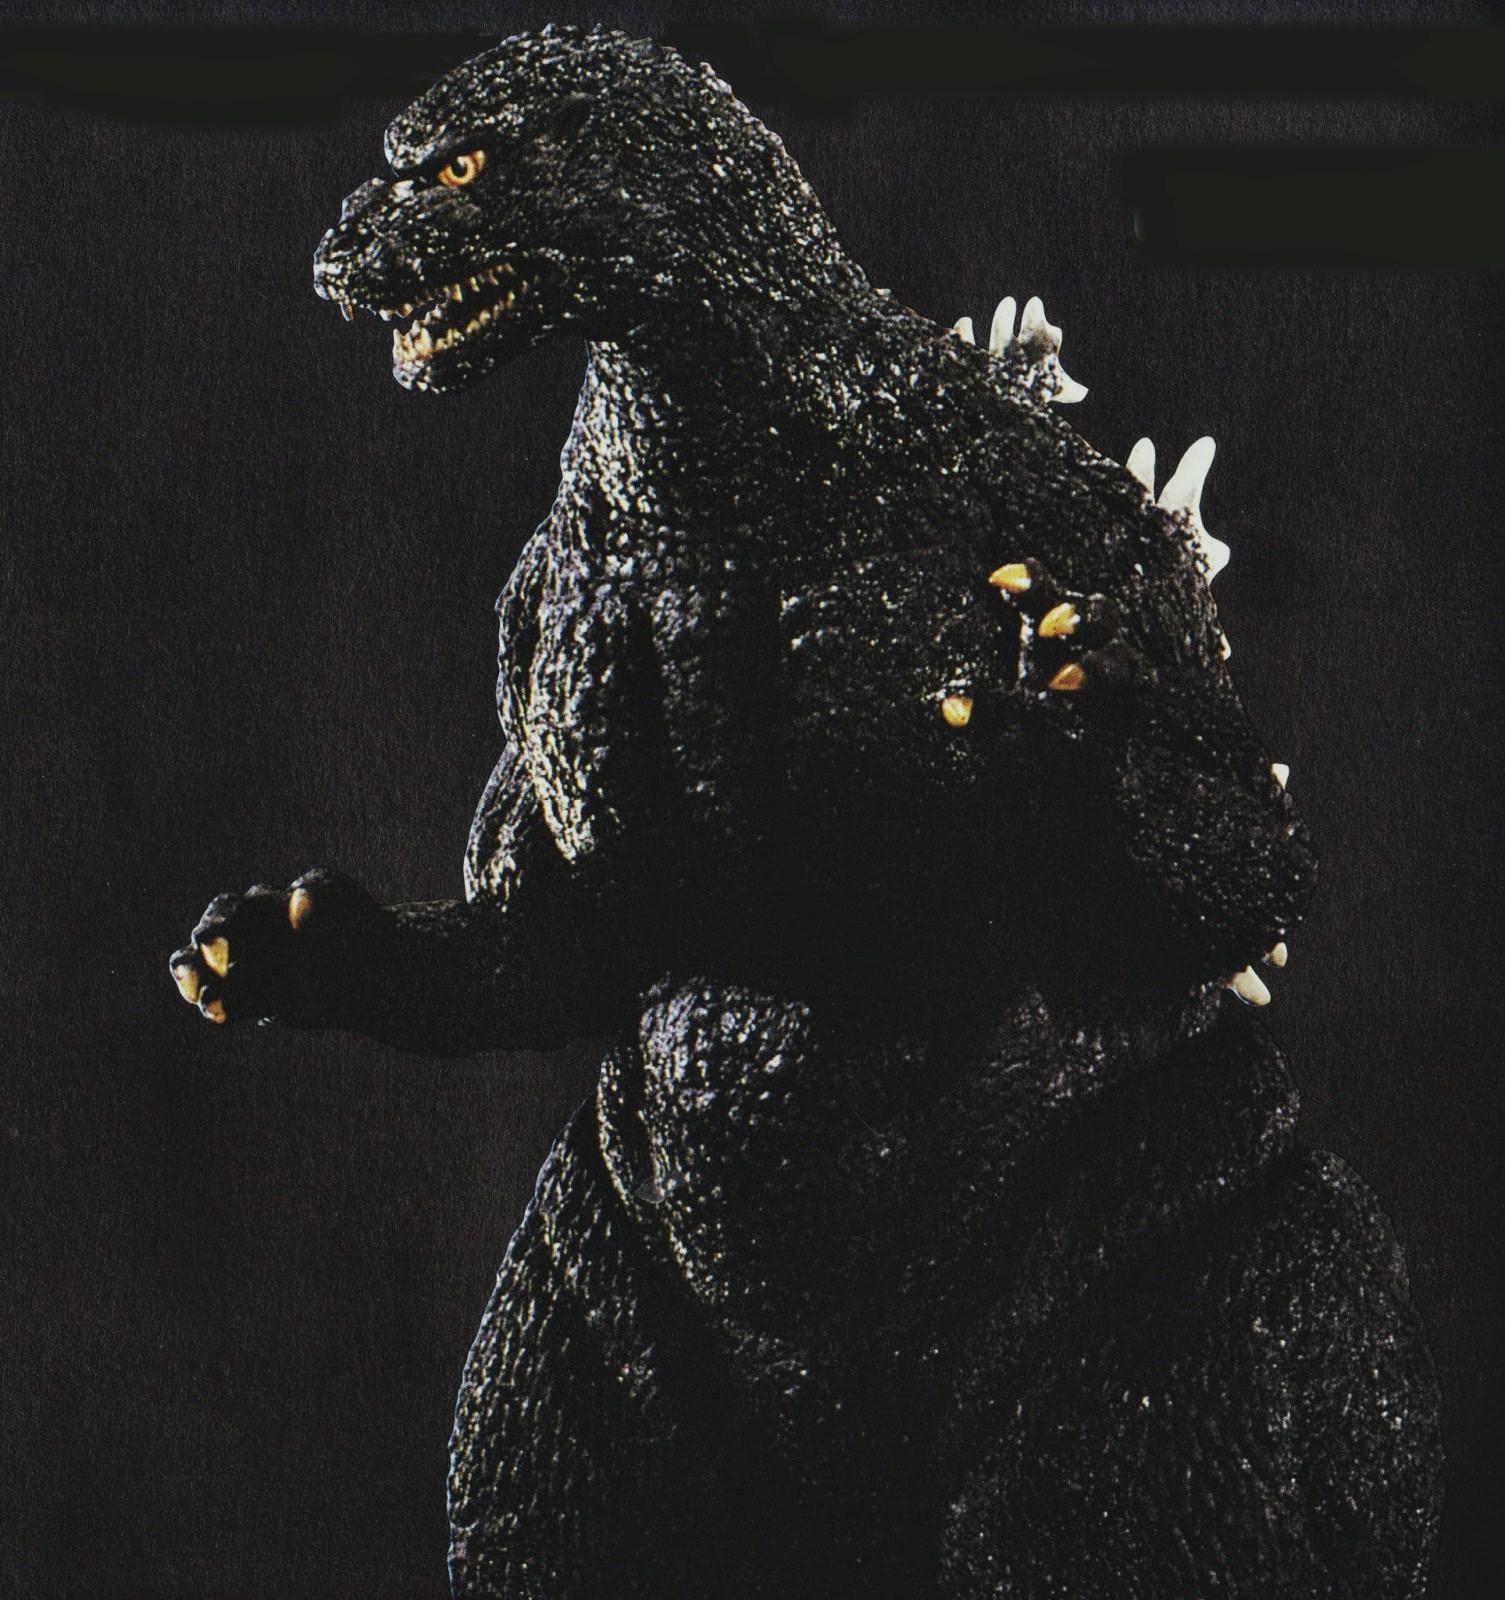 GVSG_-_Godzilla.jpg